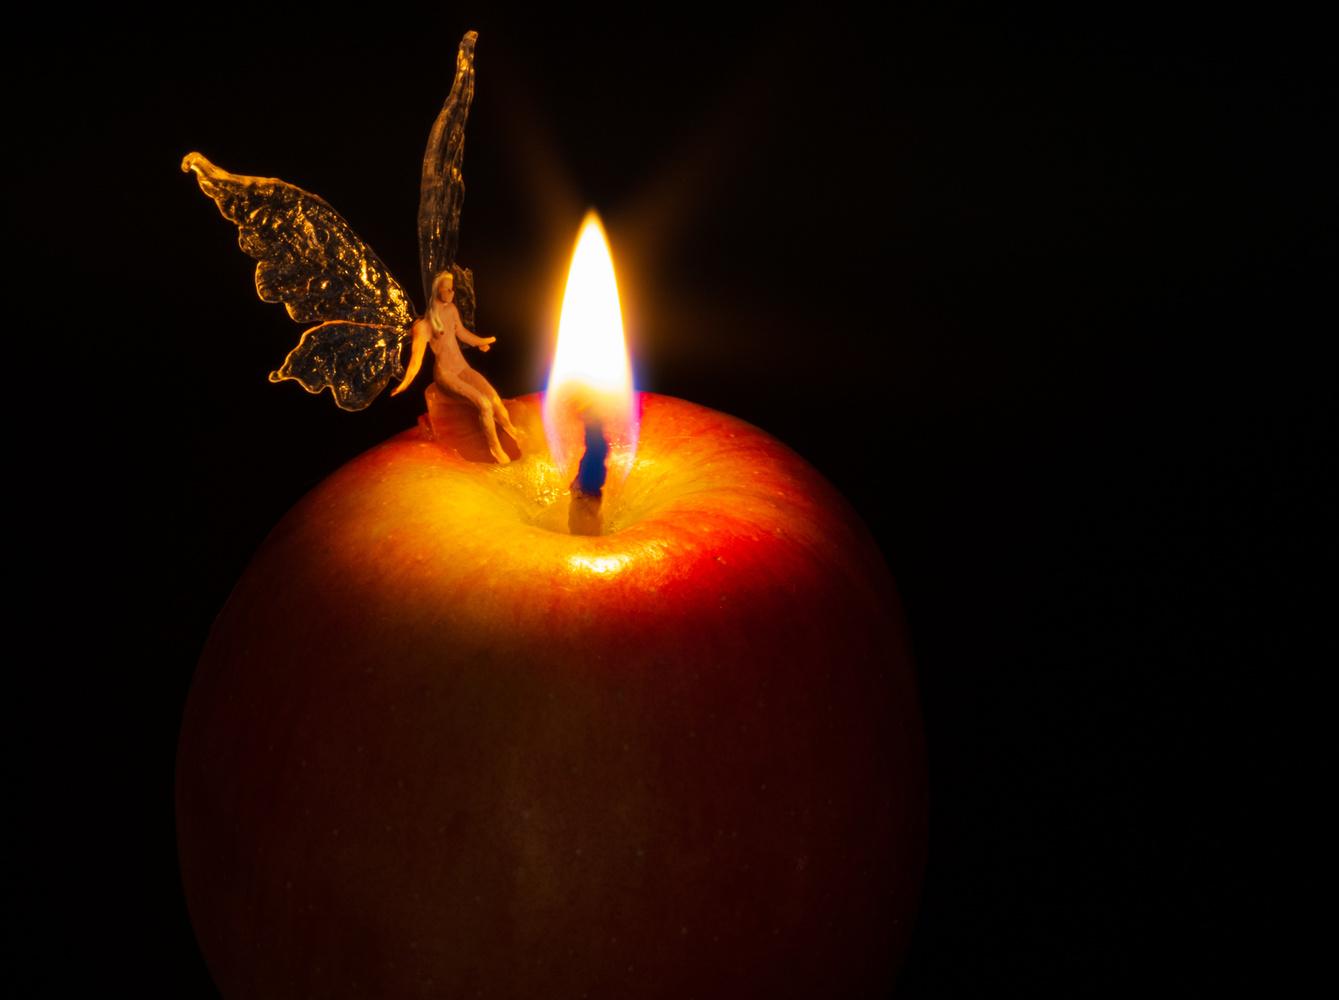 Fairy light by David Birozy